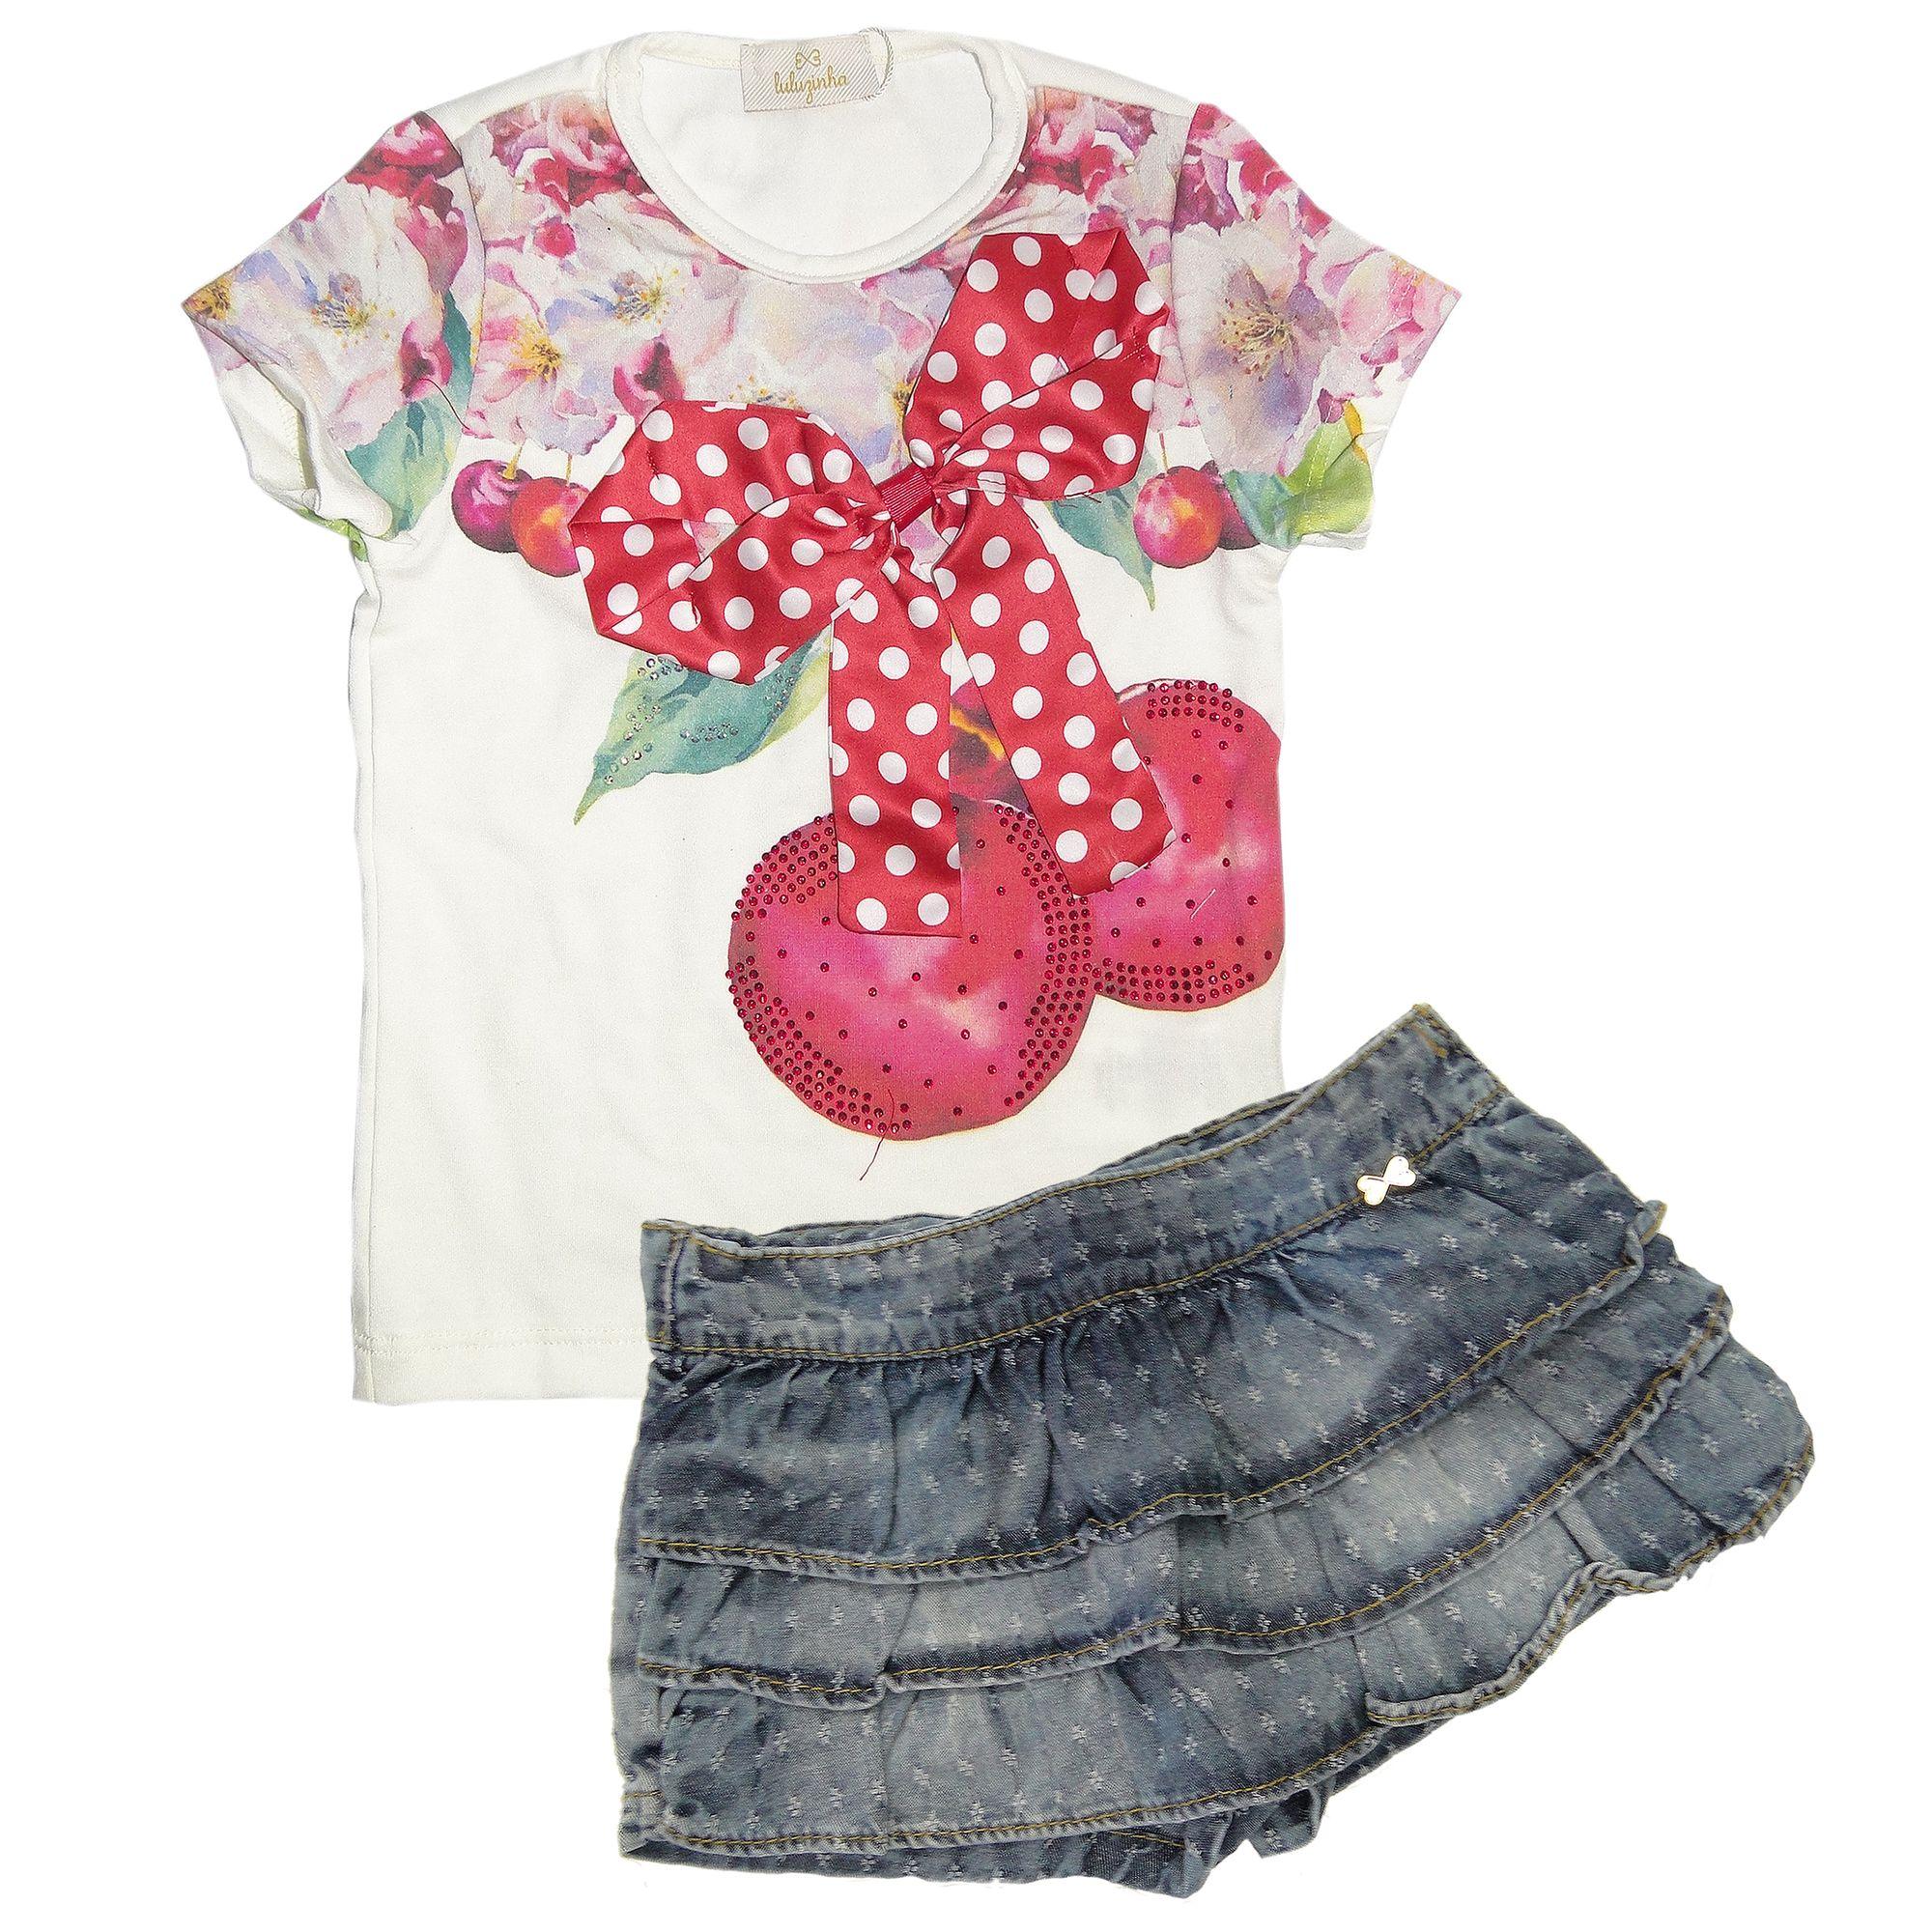 4f641aa1c81d69 Conjunto Menina Blusa Flores e Aplique de Laço e Short Saia Jeans ...